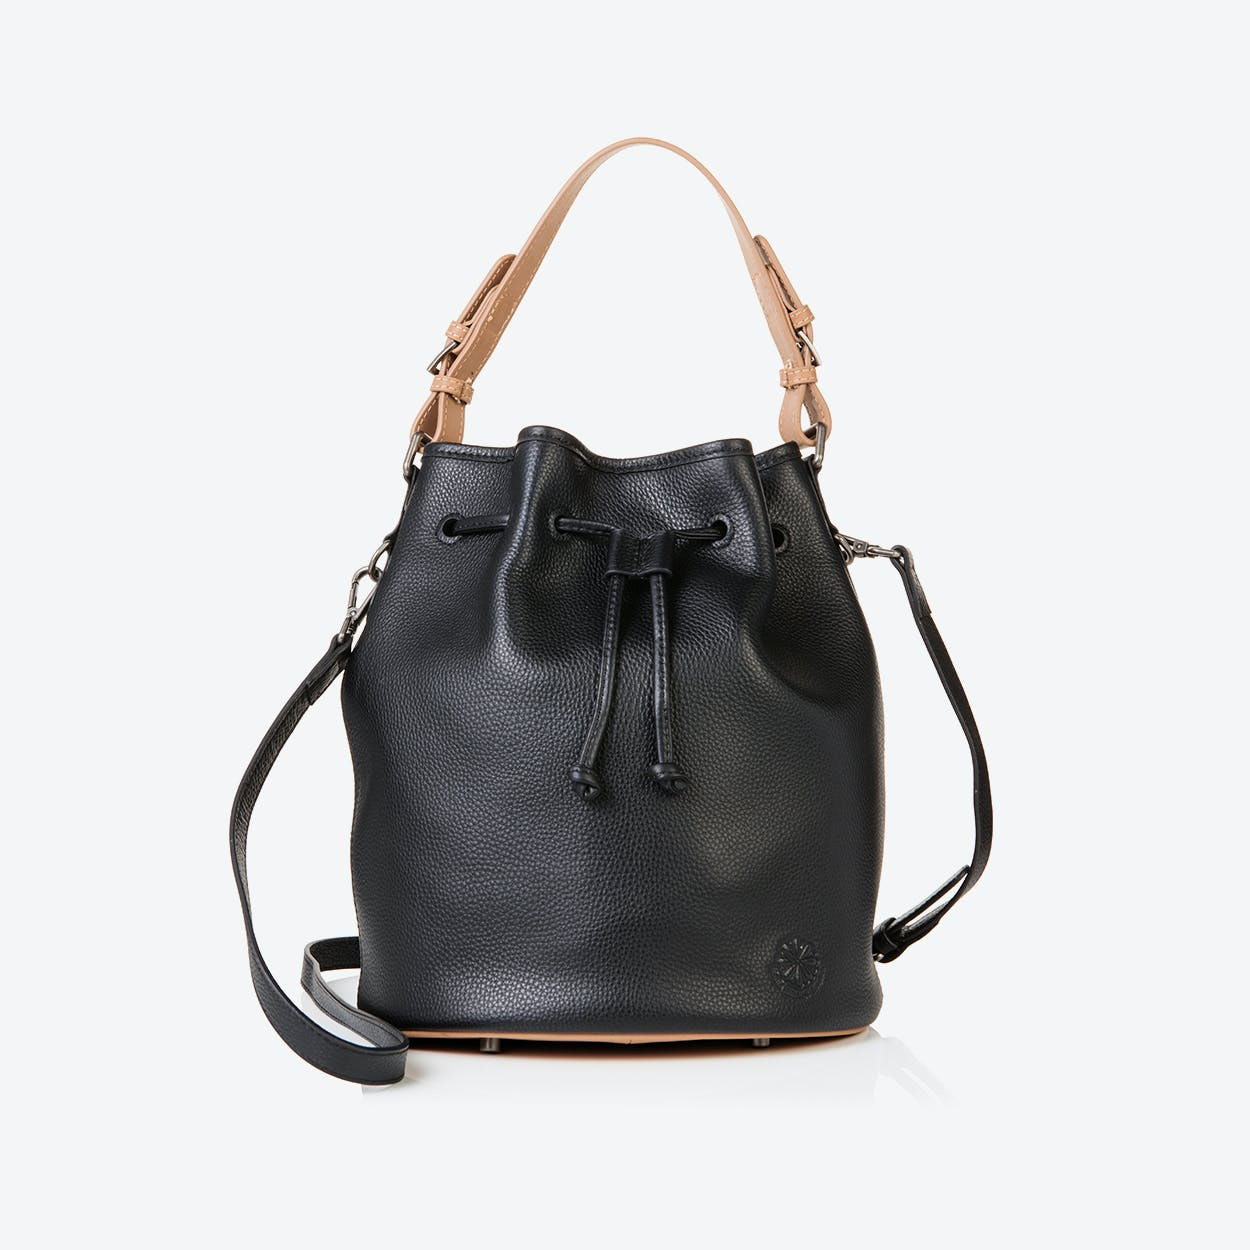 Islington Bucket Bag in Black